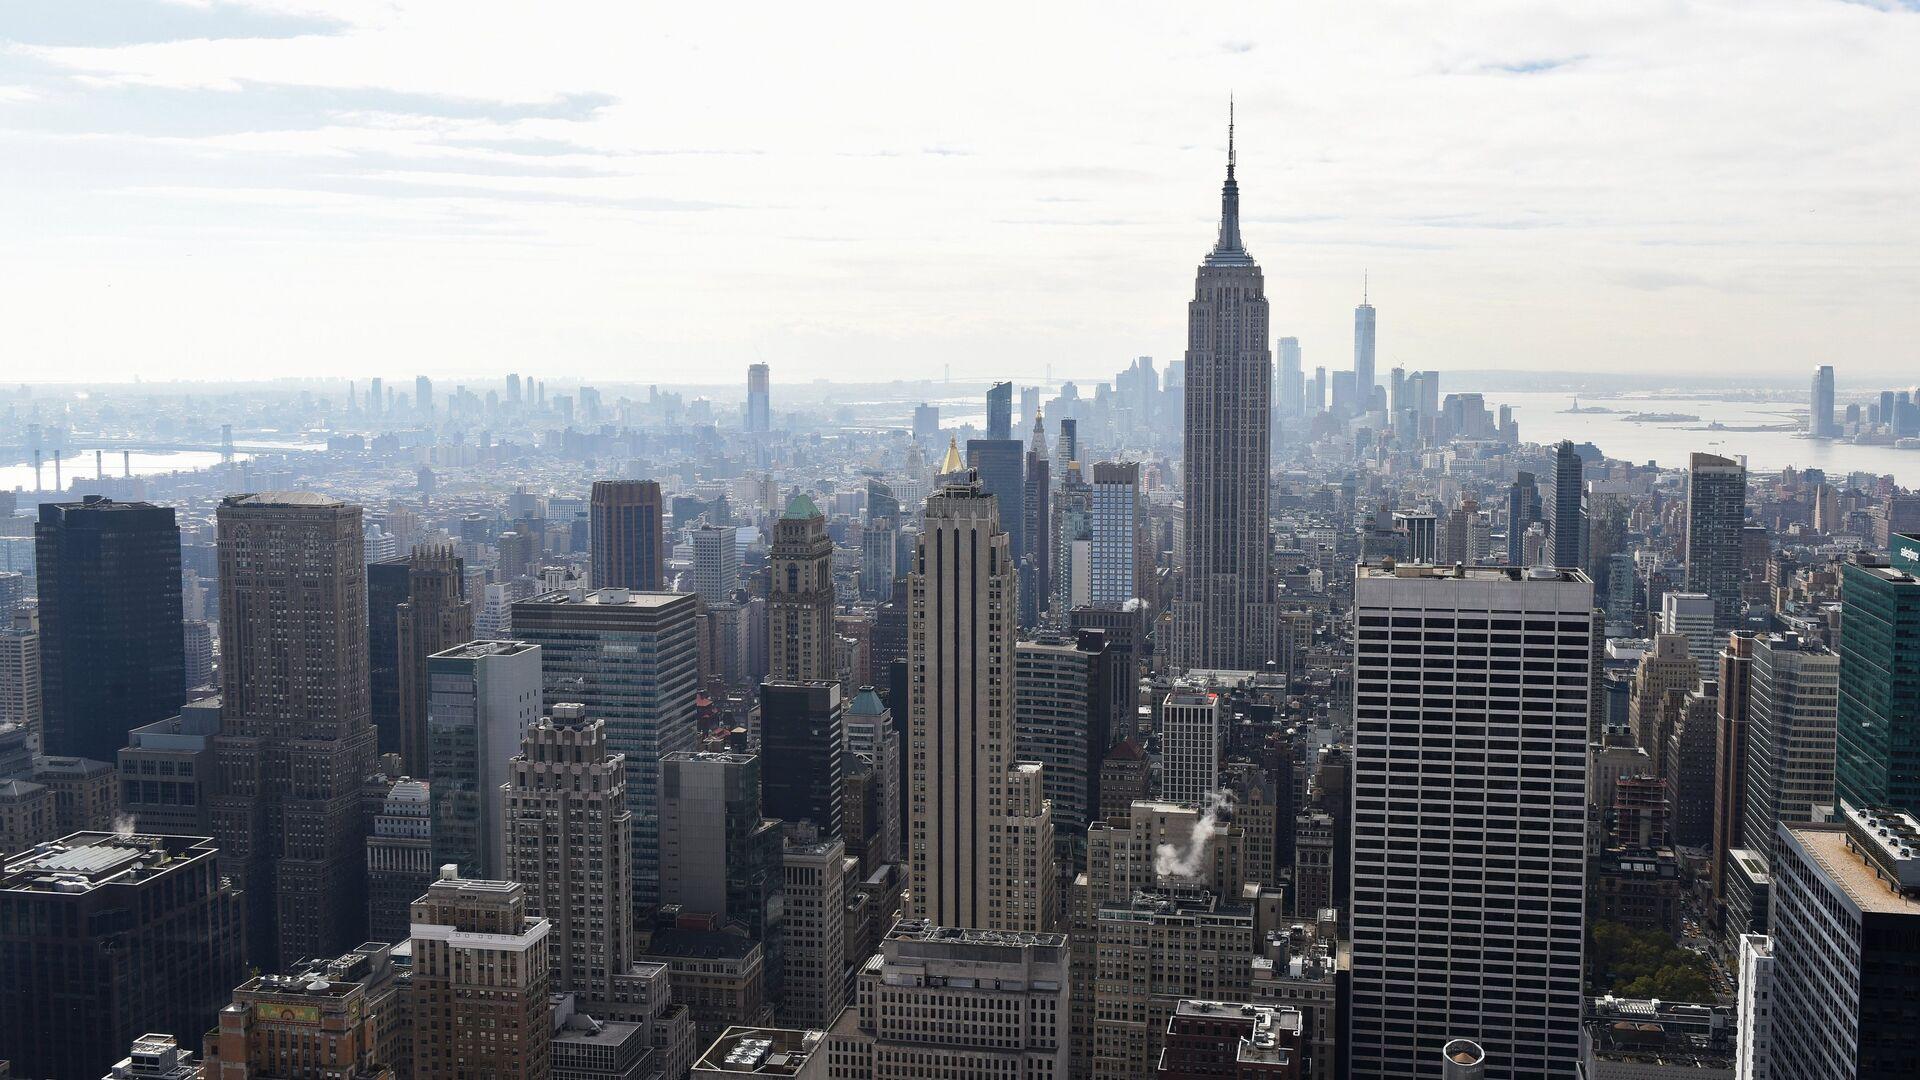 Эмпайр-стейт-билдинг в Нью-Йорке на Манхэттене - РИА Новости, 1920, 20.03.2018